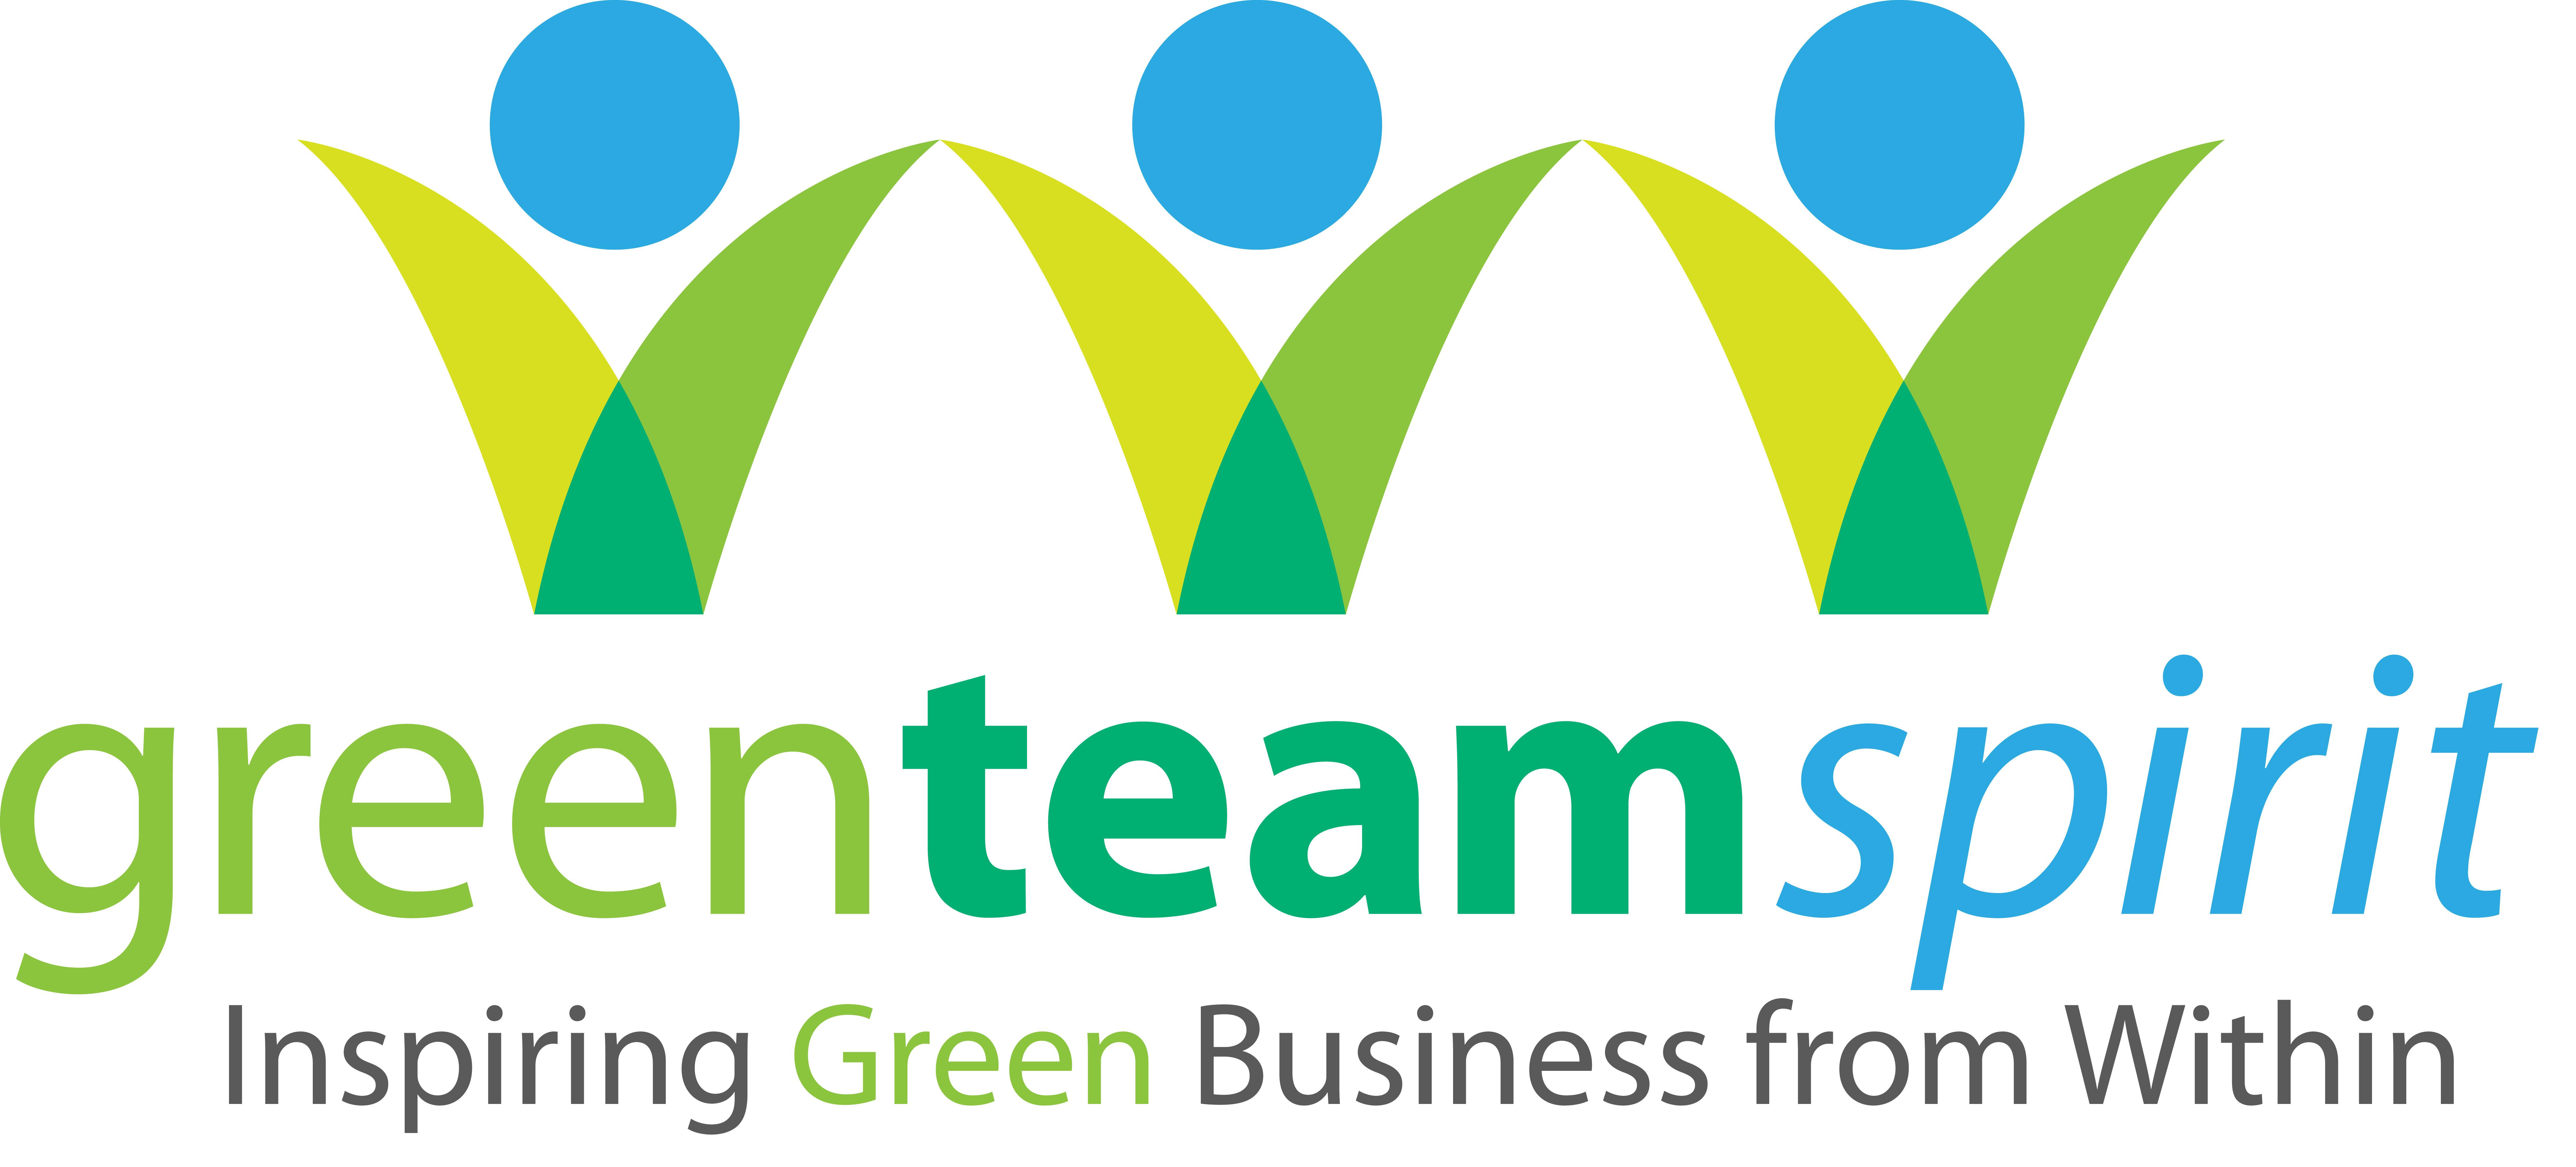 Green Team Spirit